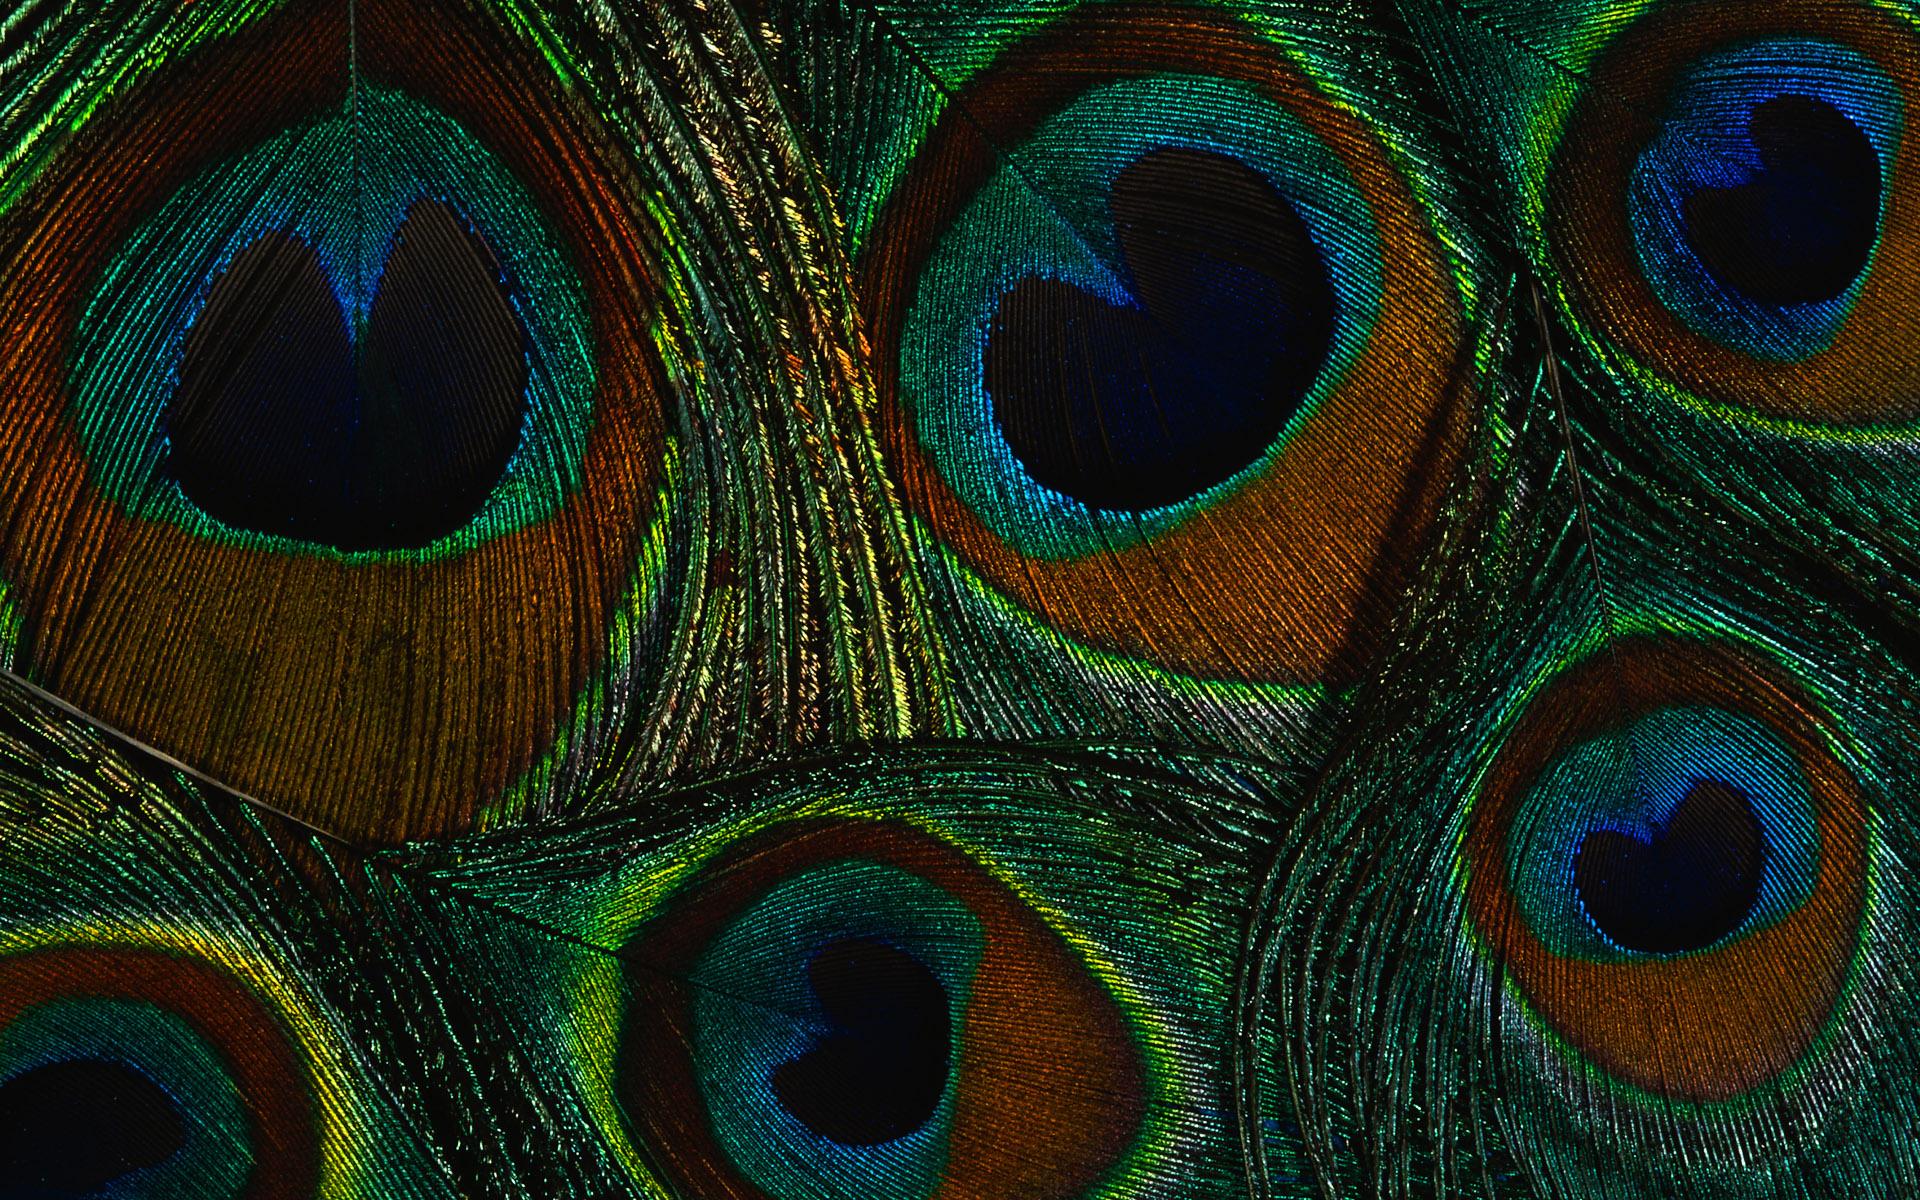 Peacock Feather Wallpaper 867502 Peacock Feather Wallpaper 867479 1920x1200